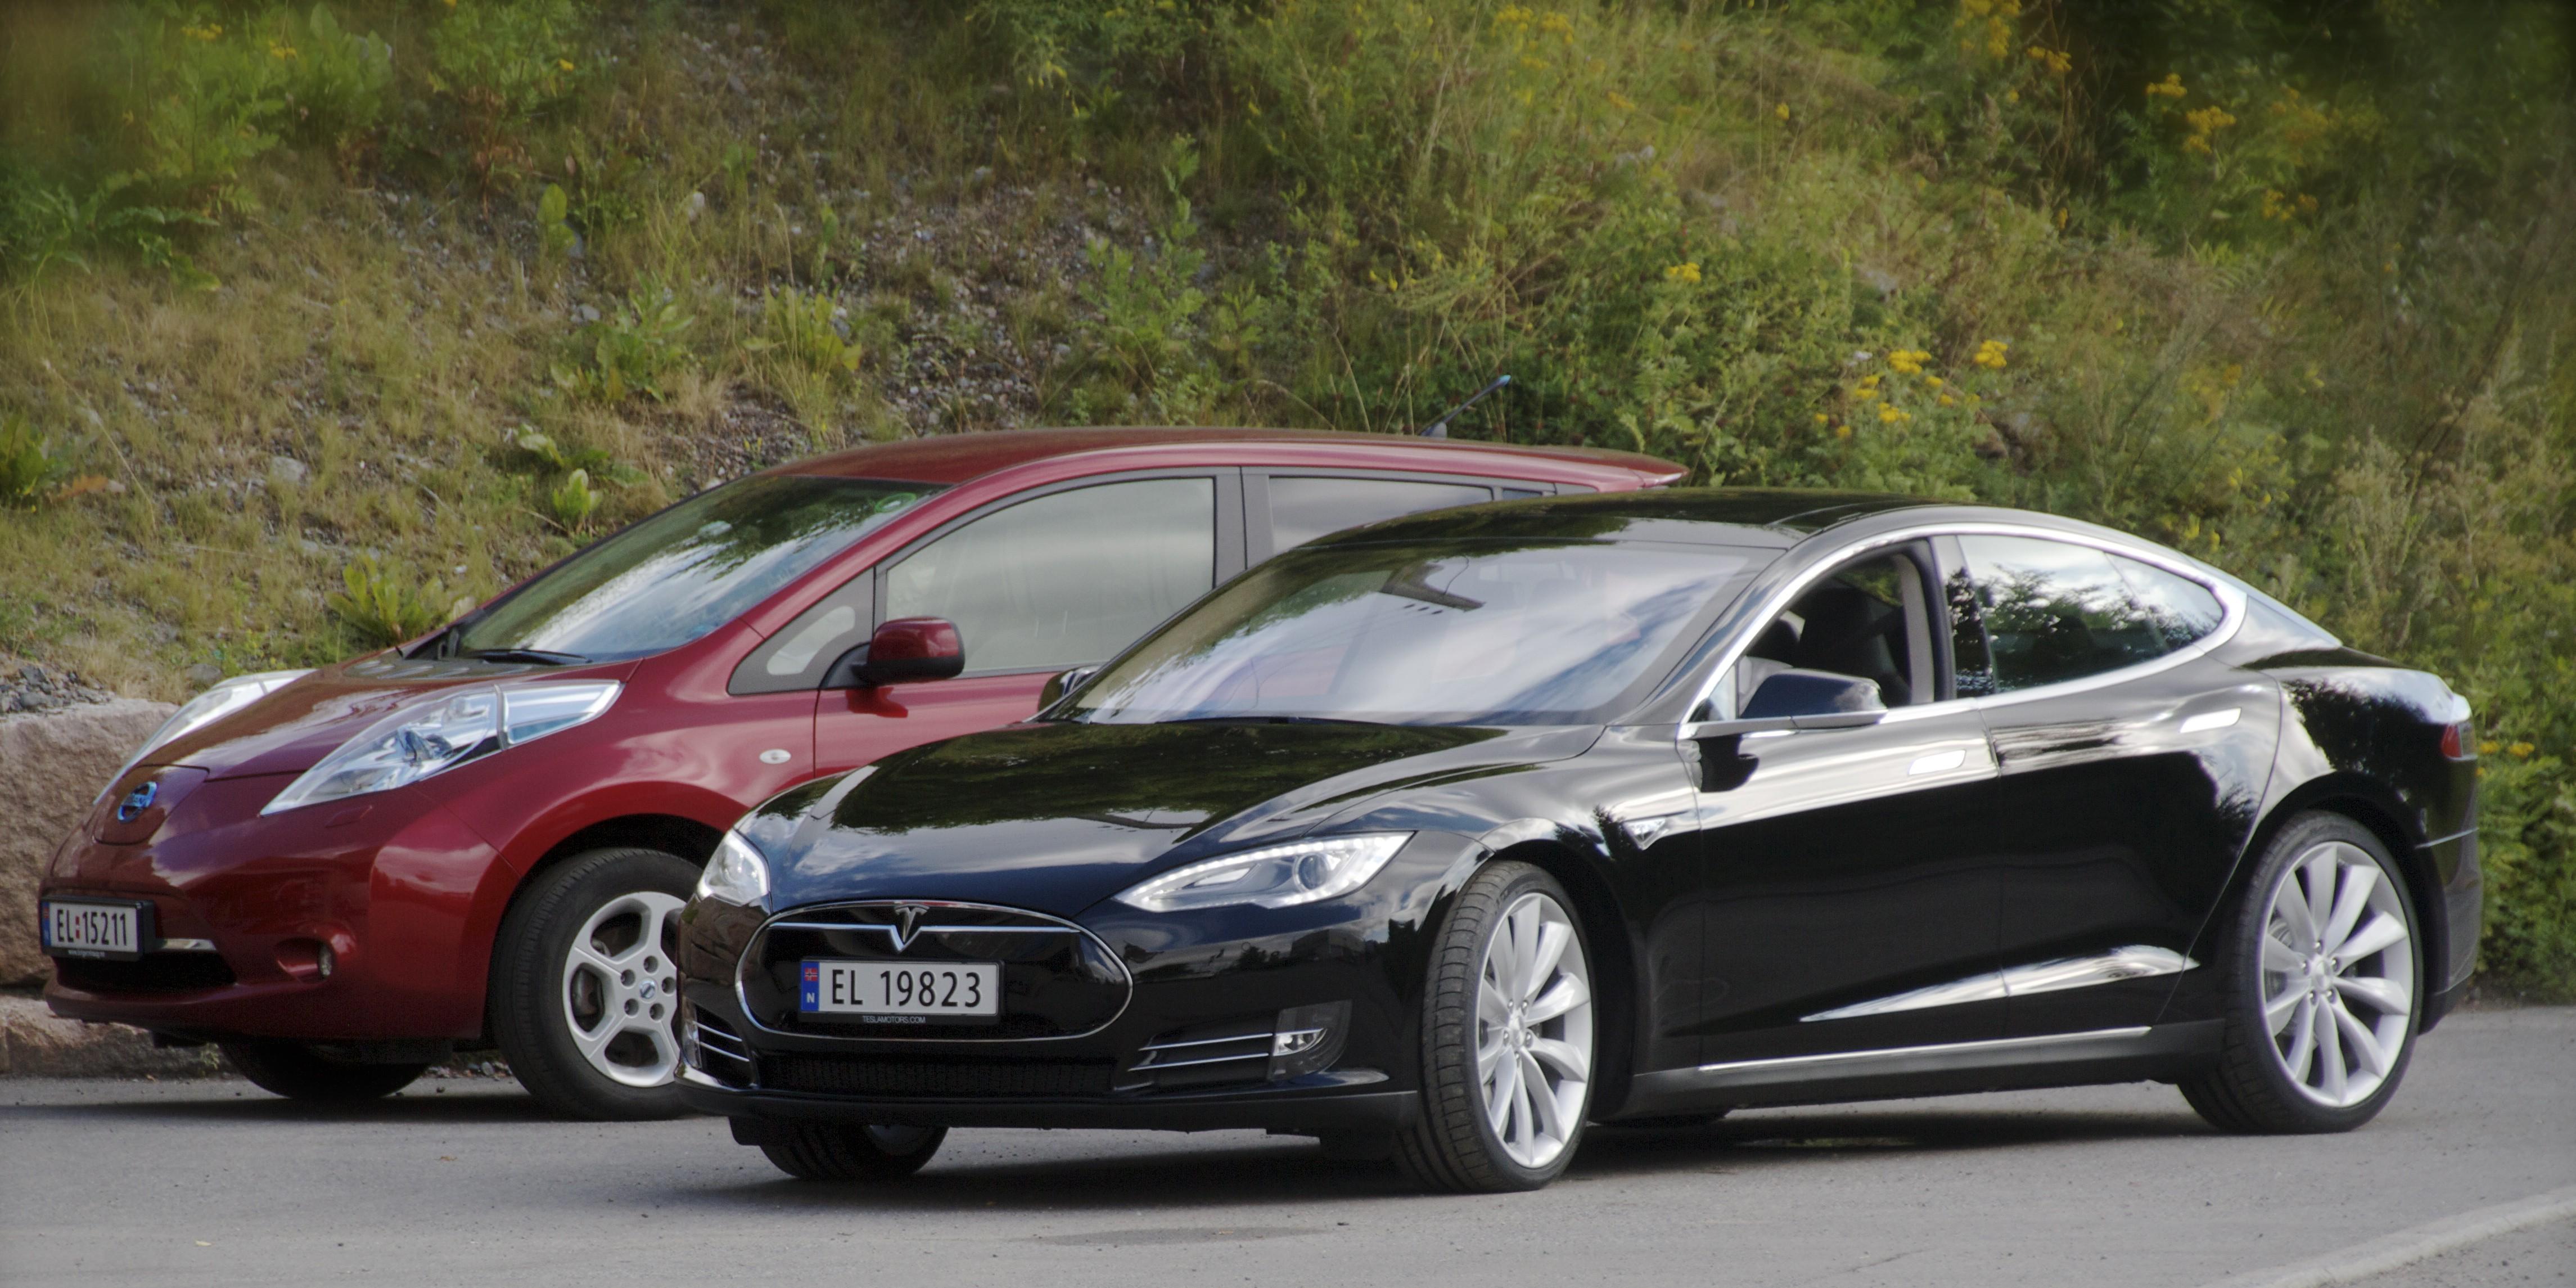 LEAF Model S